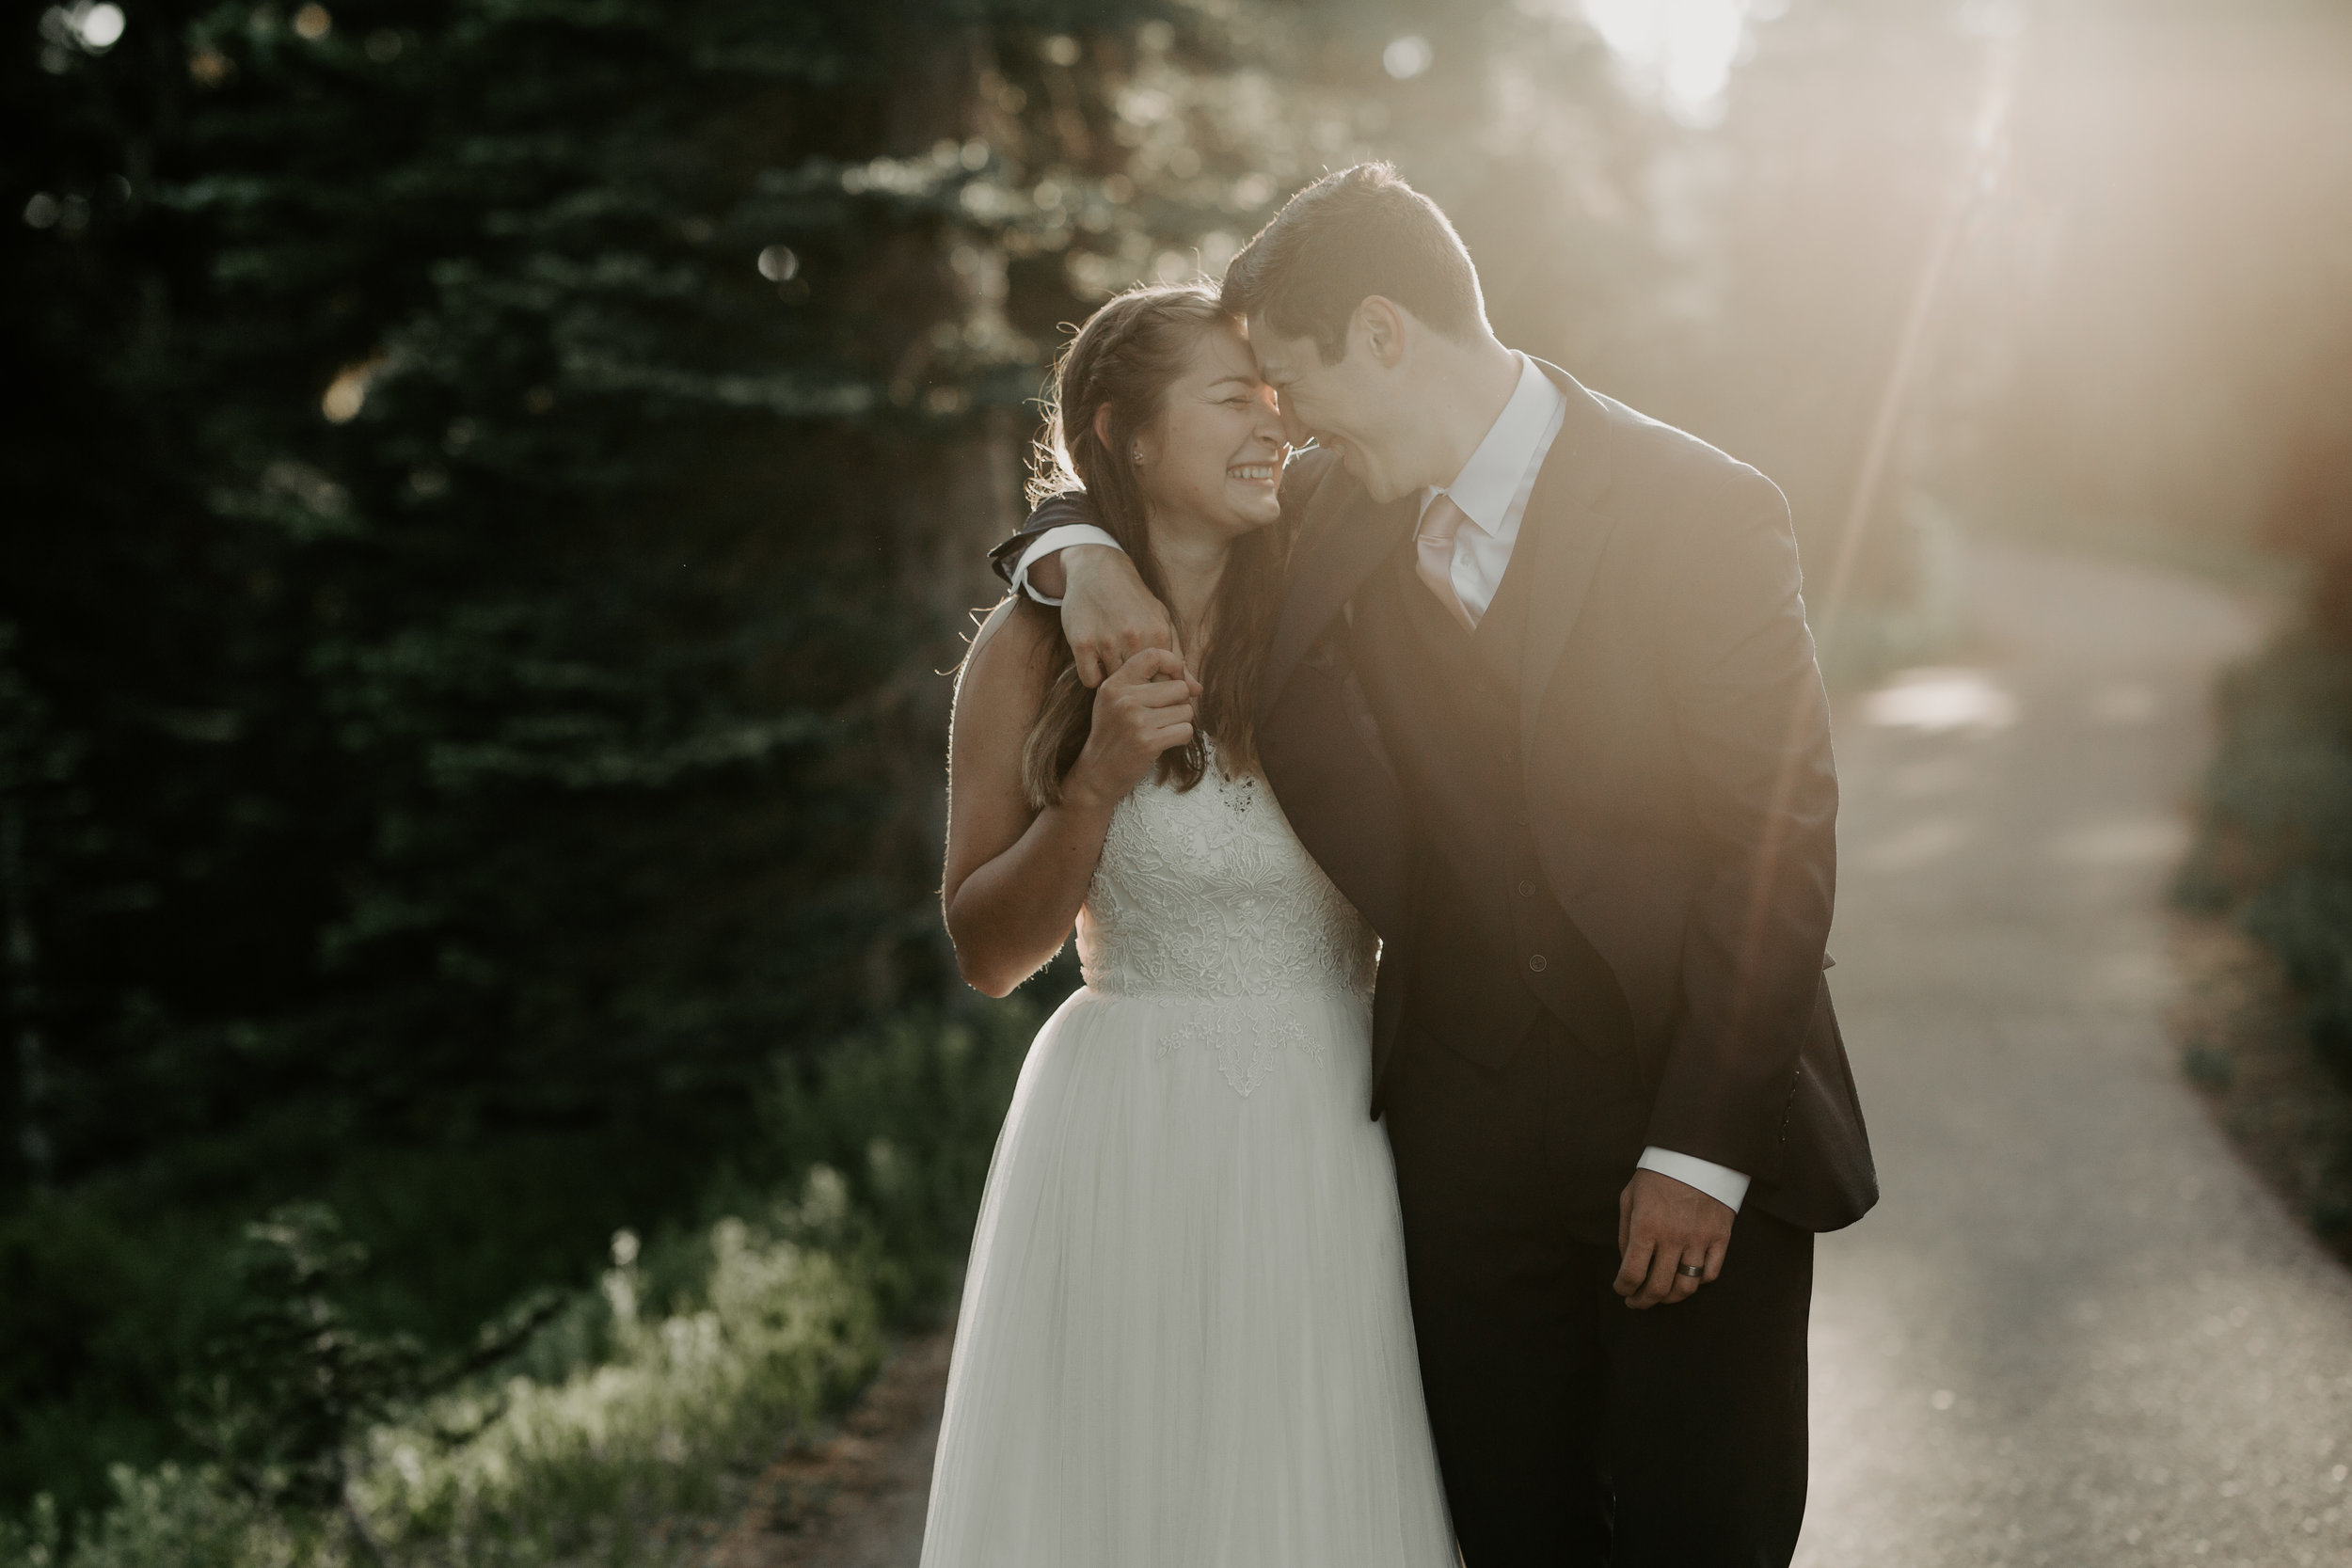 Nicole-Daacke-Photography-Mt-Rainier-elopement-photographer-washington-mountain-epic-wedding-photography-wildflowers-at-rainier-pine-tree-cloudy-summer-day-at-mountain-rainier-22.jpg